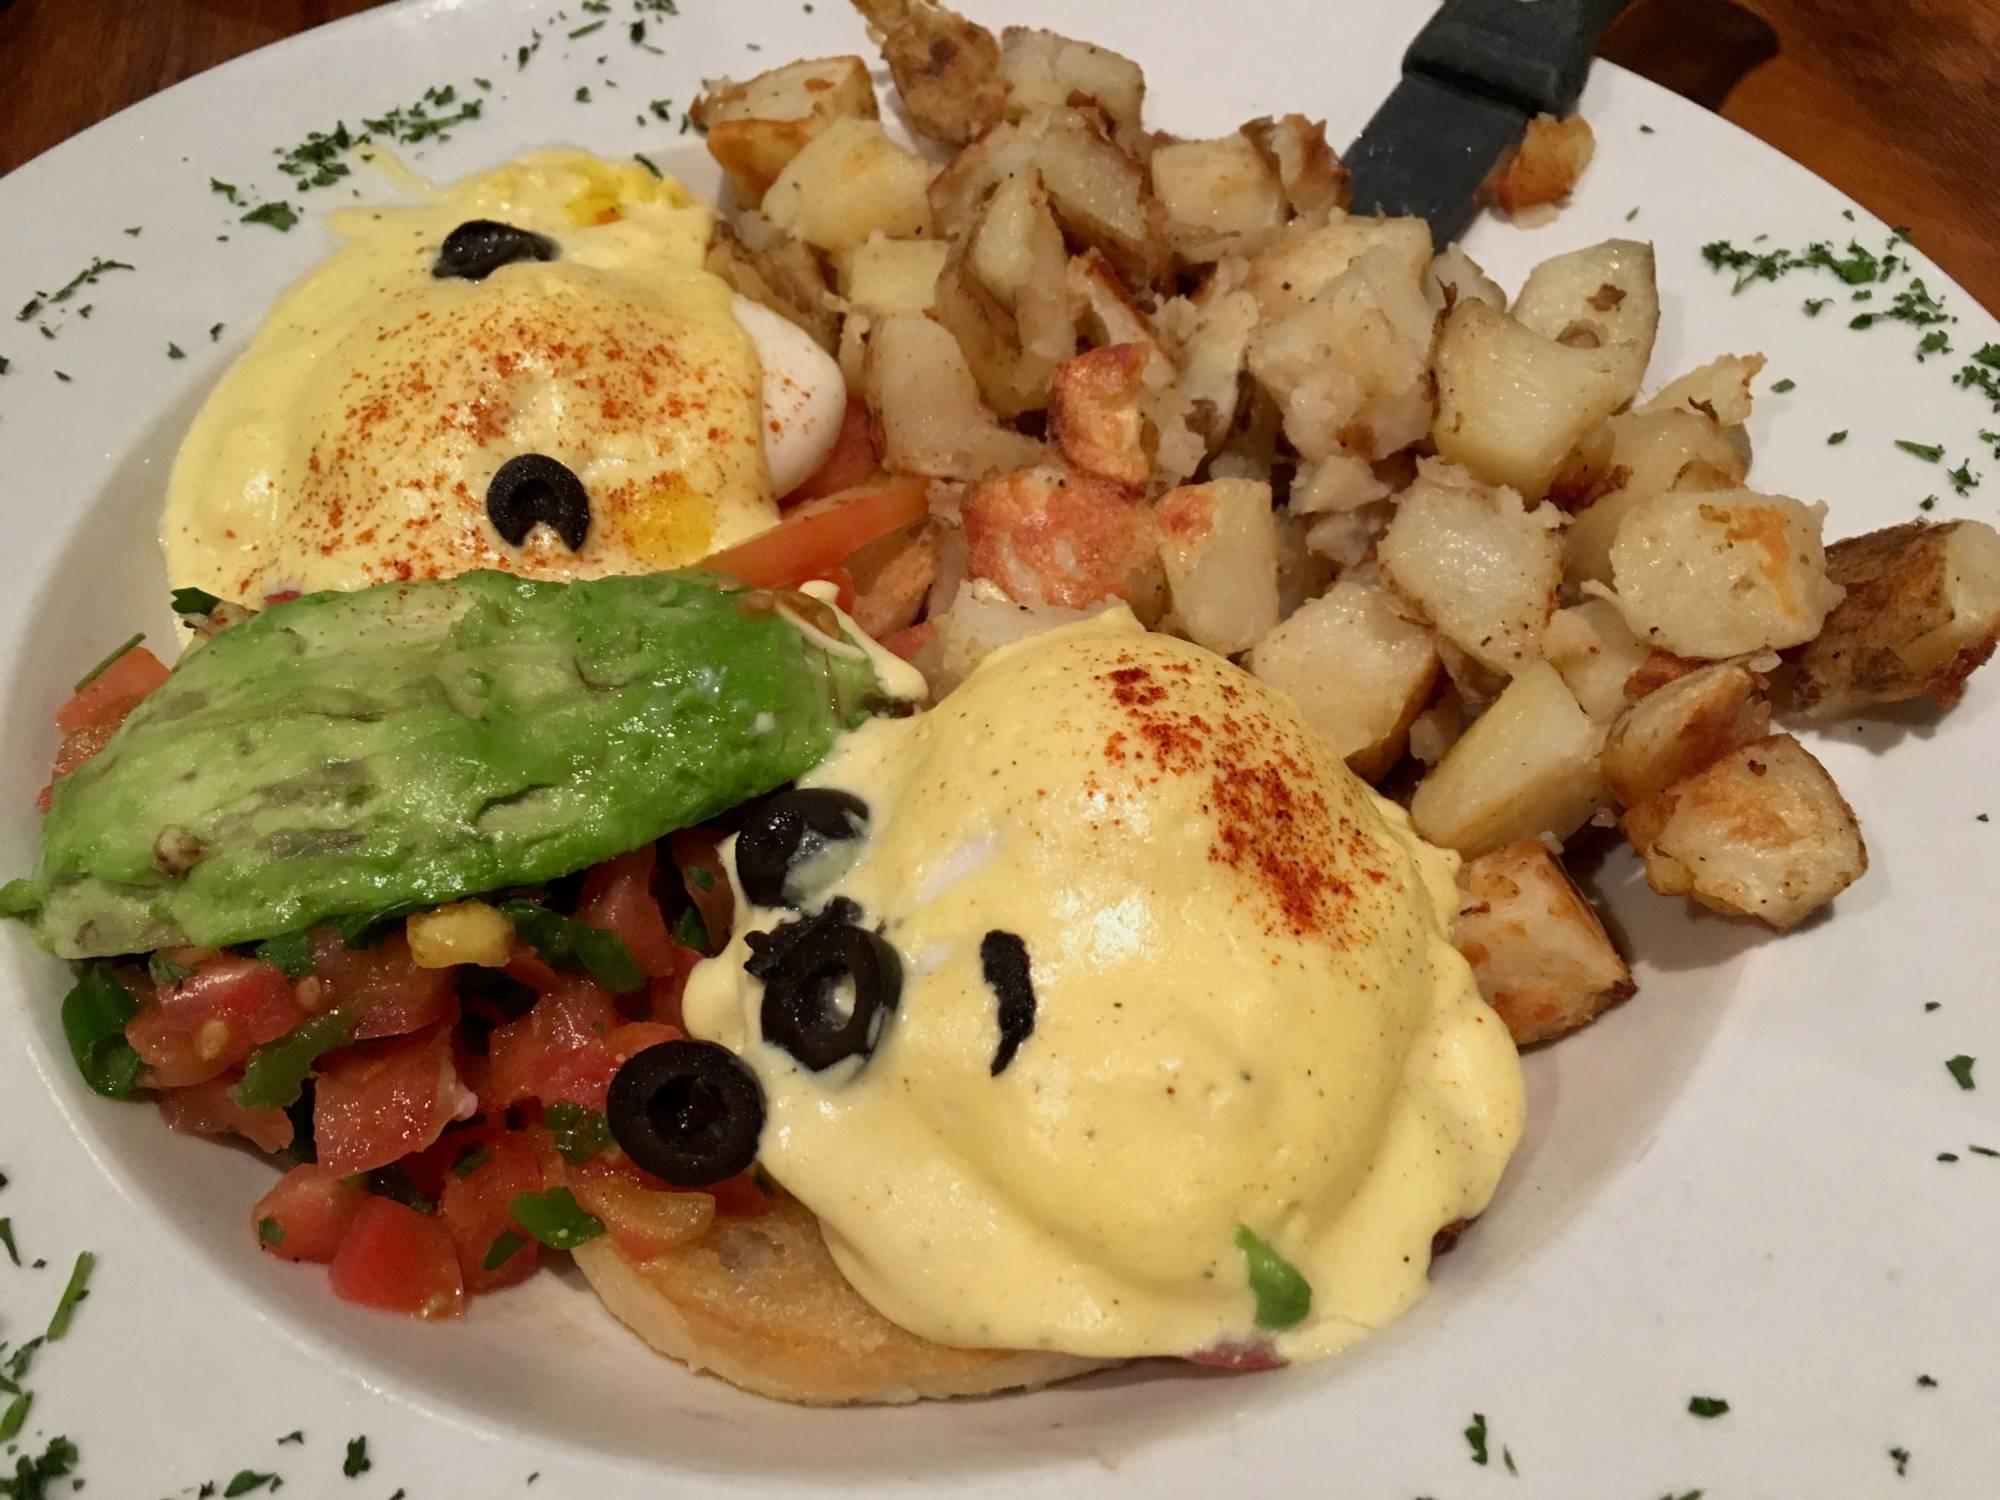 The Huevos Rancheros Omelet at Hobee's in Palo Alto.